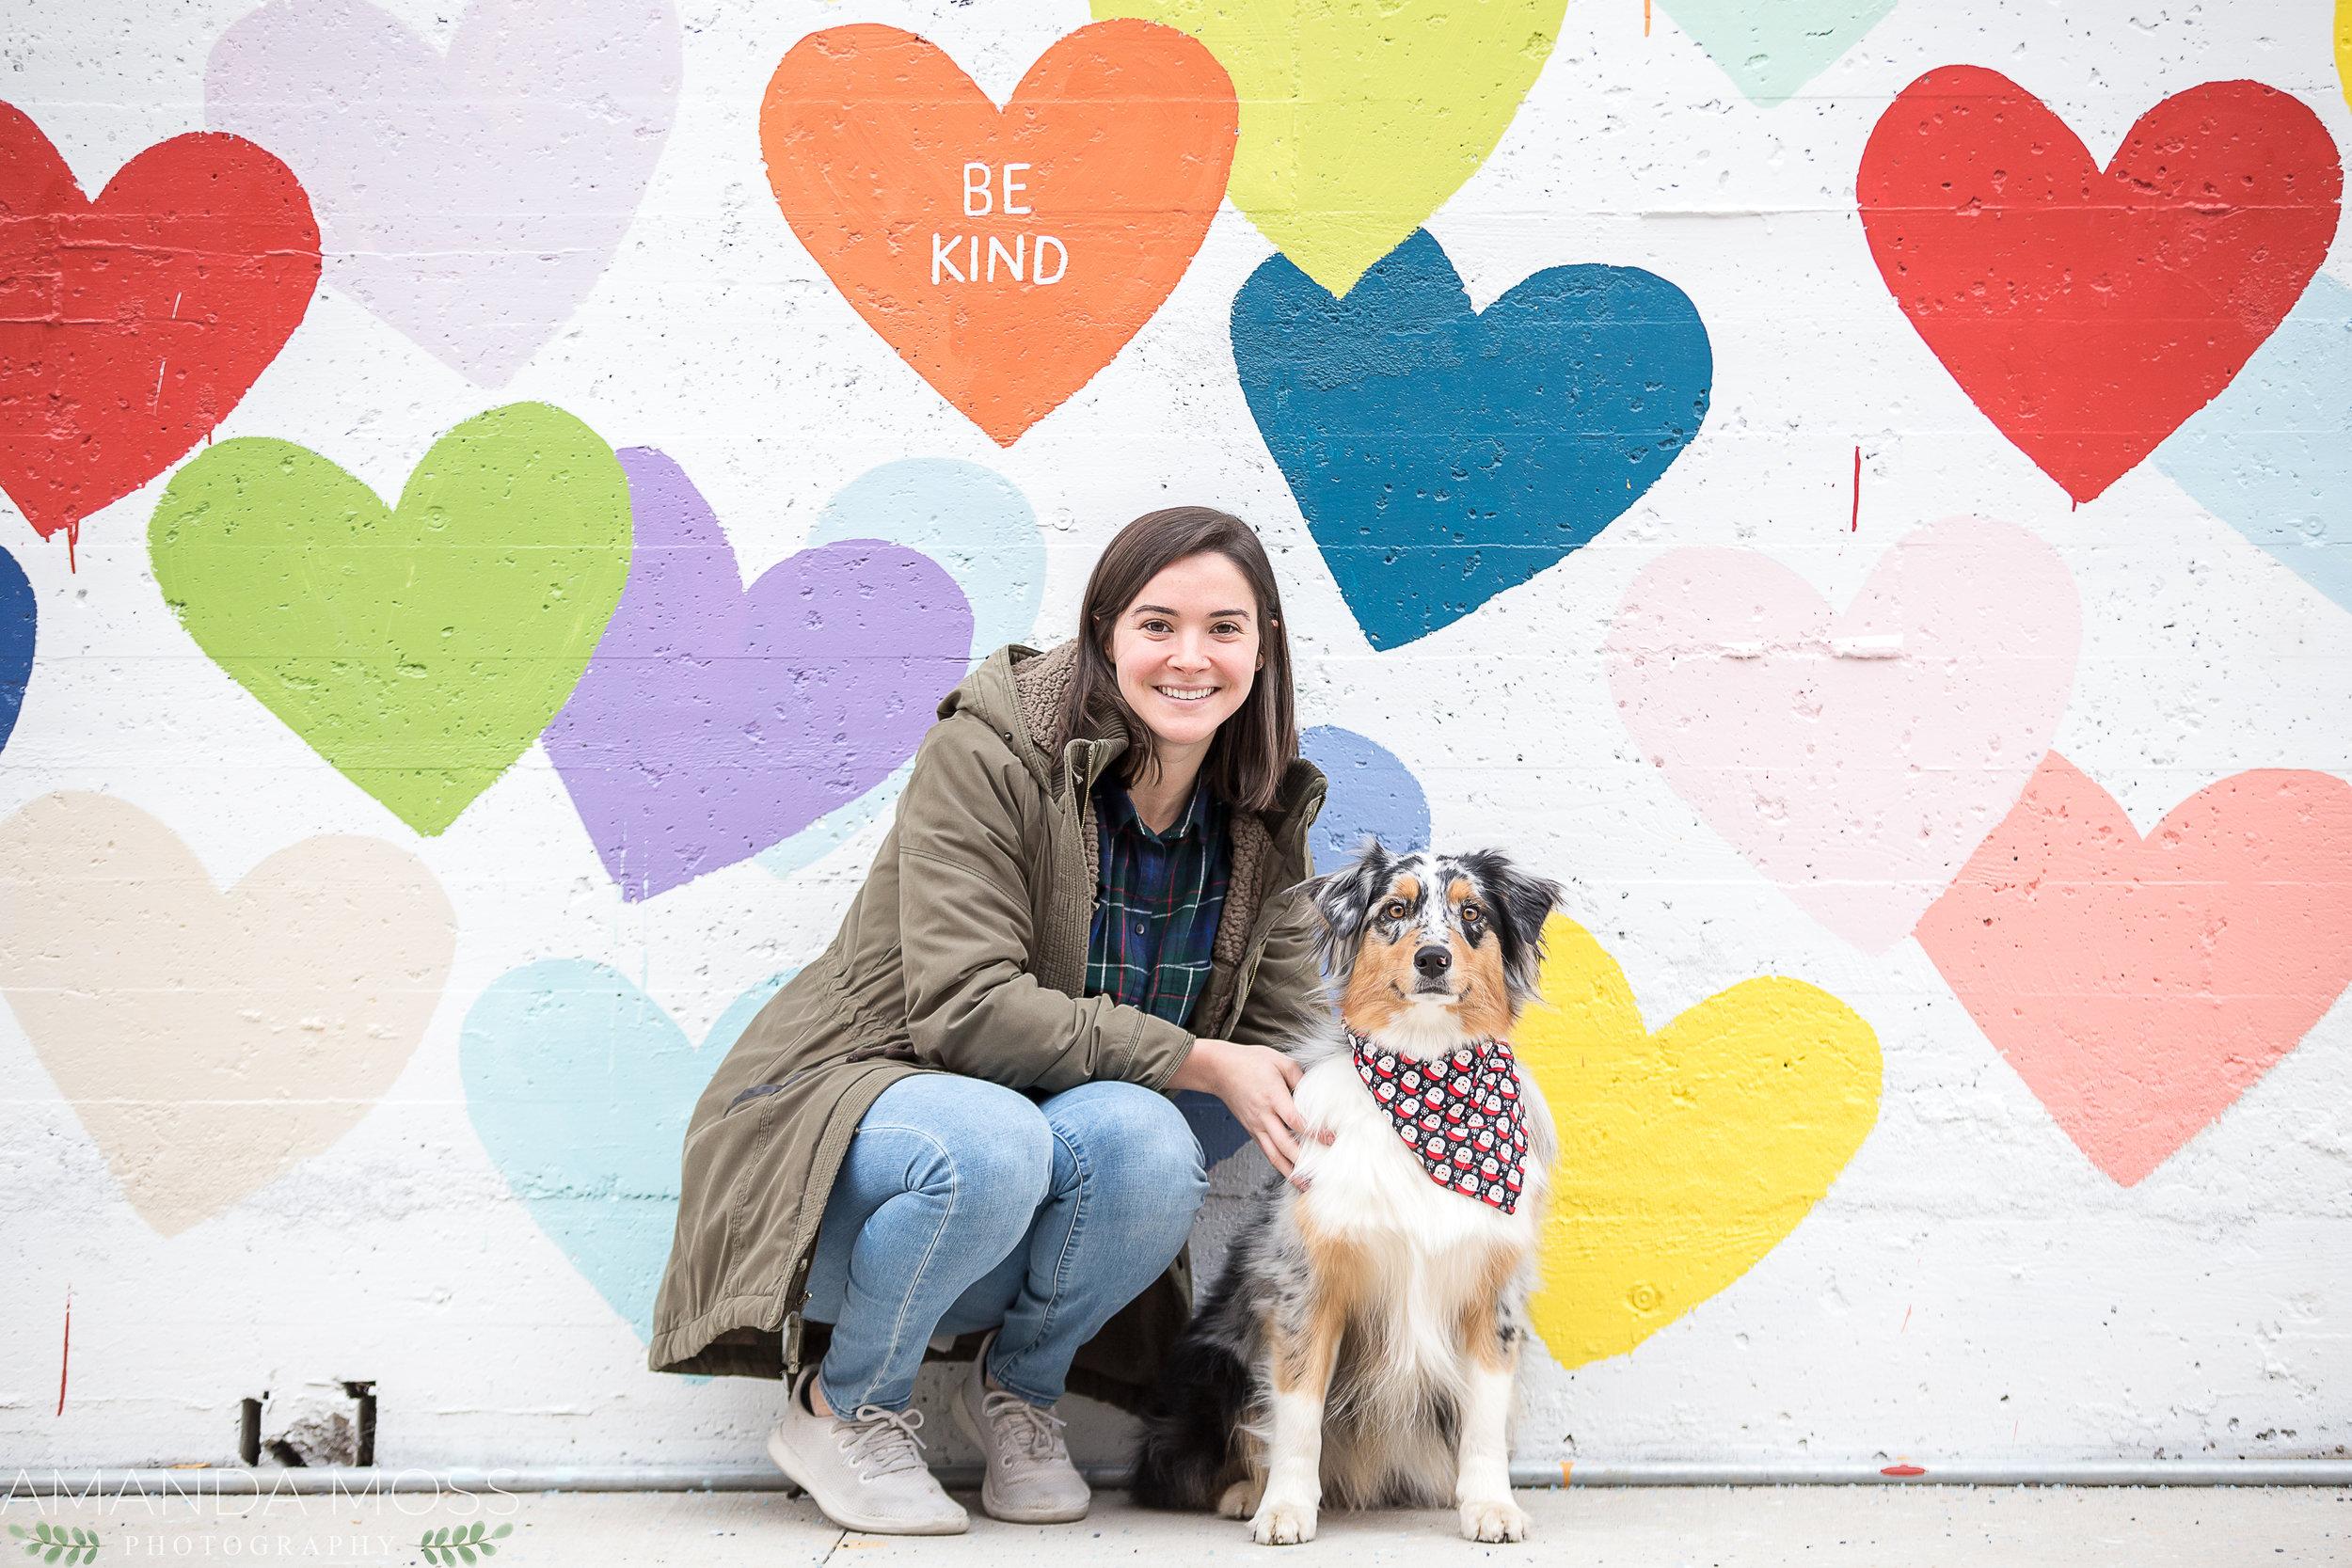 charlotte photographer wedding family portrait southend confetti hearts wall